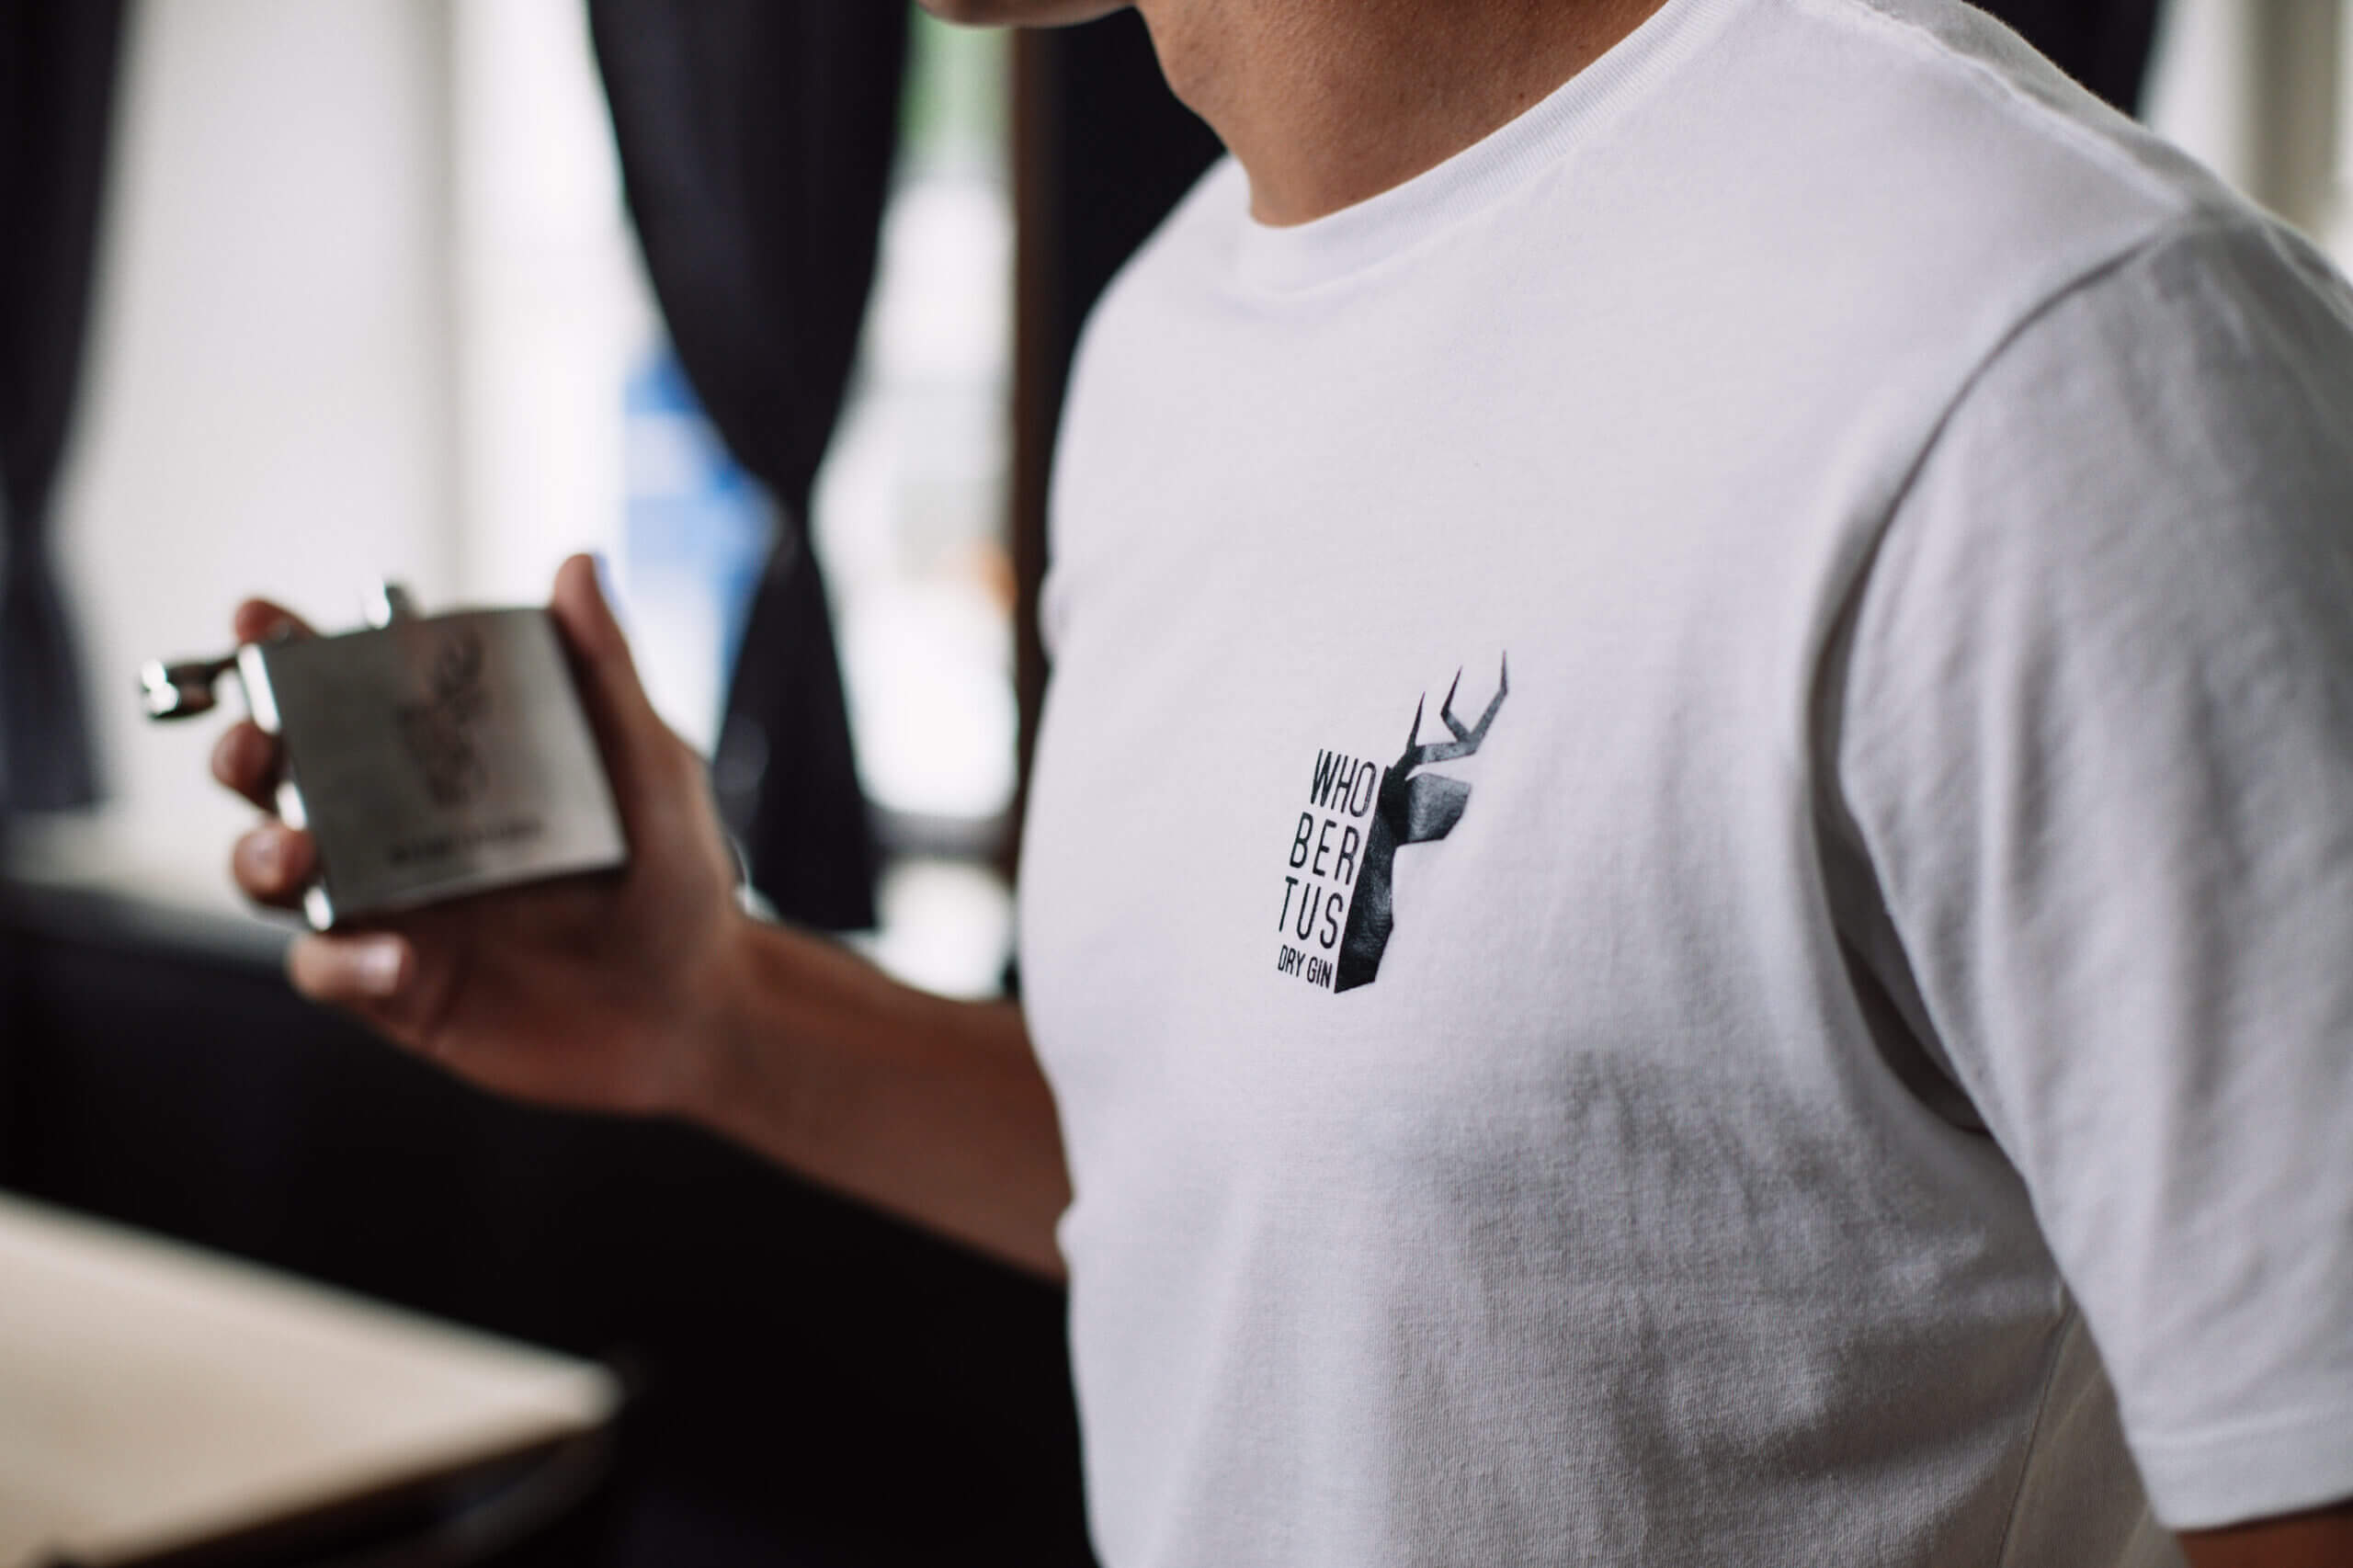 *NEU* Limitierte WHOBERTUS T-Shirts